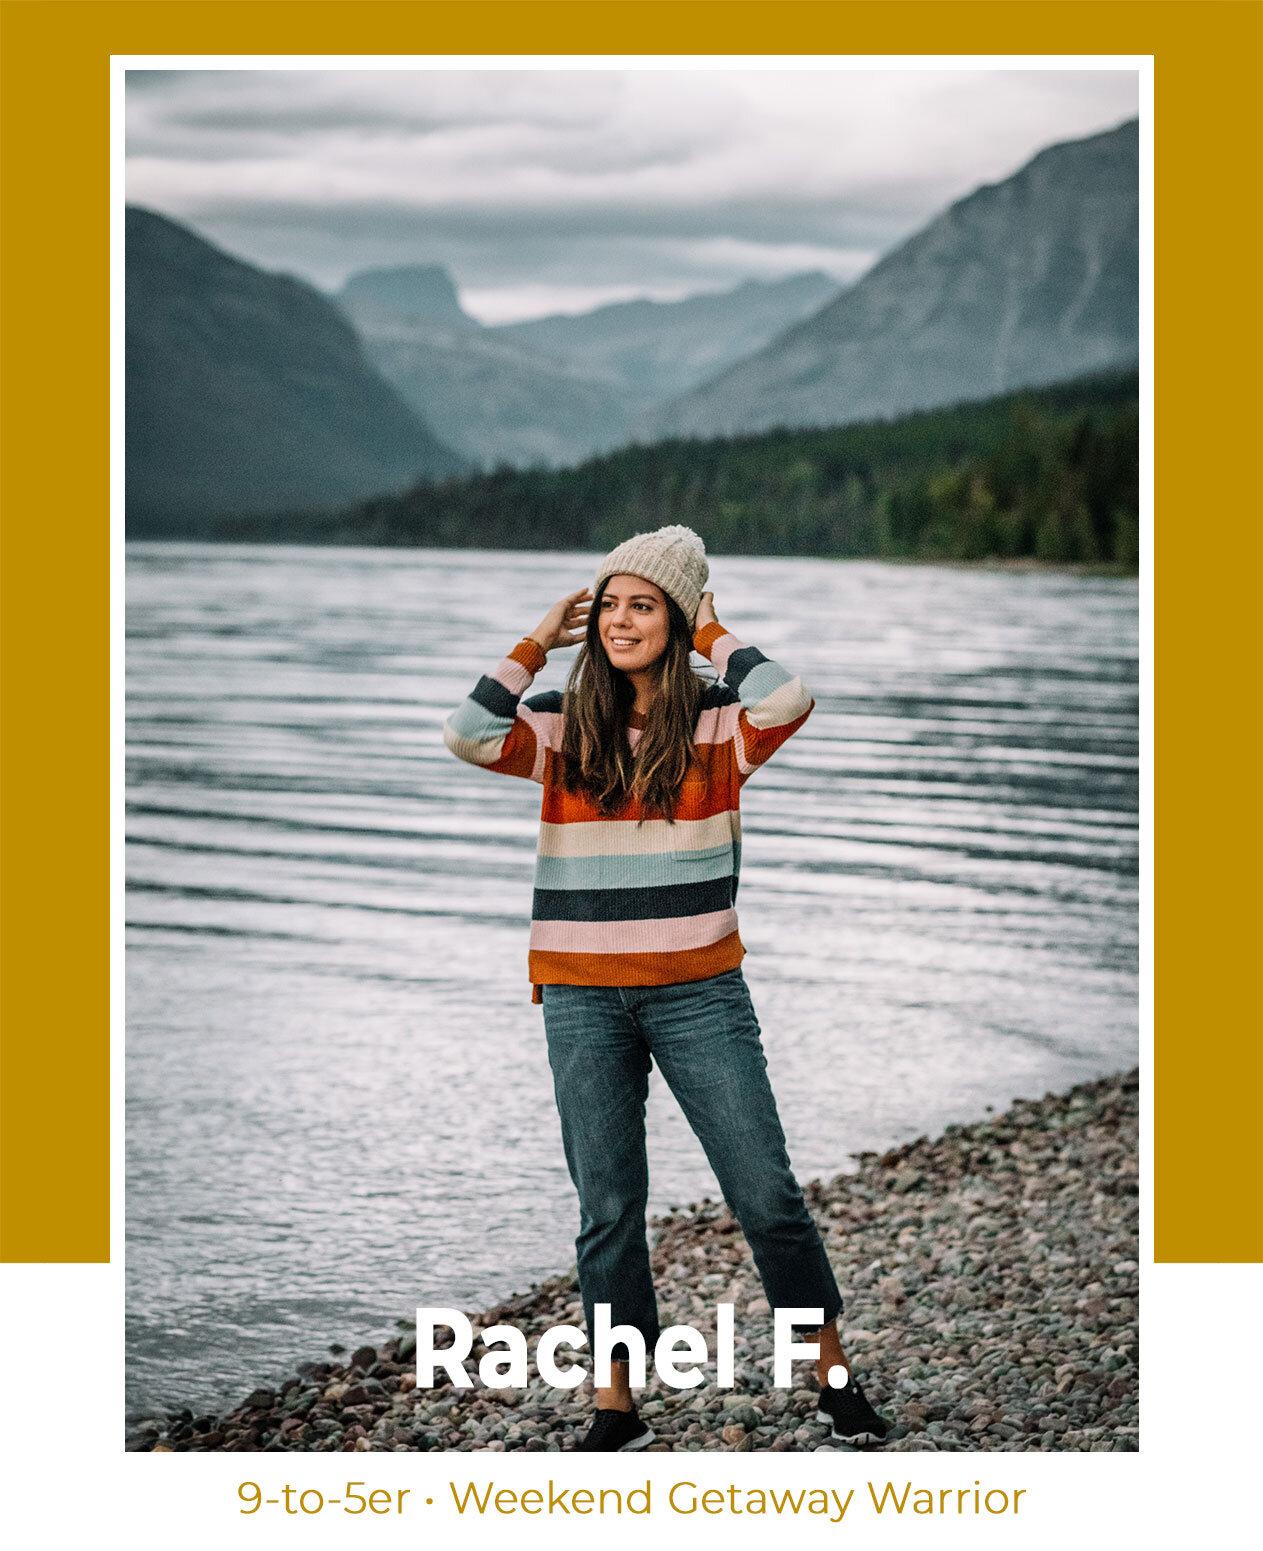 Rachel Off Duty: How These Women Travel More While Maintaining Their Careers - Rachel-Jean Firchau